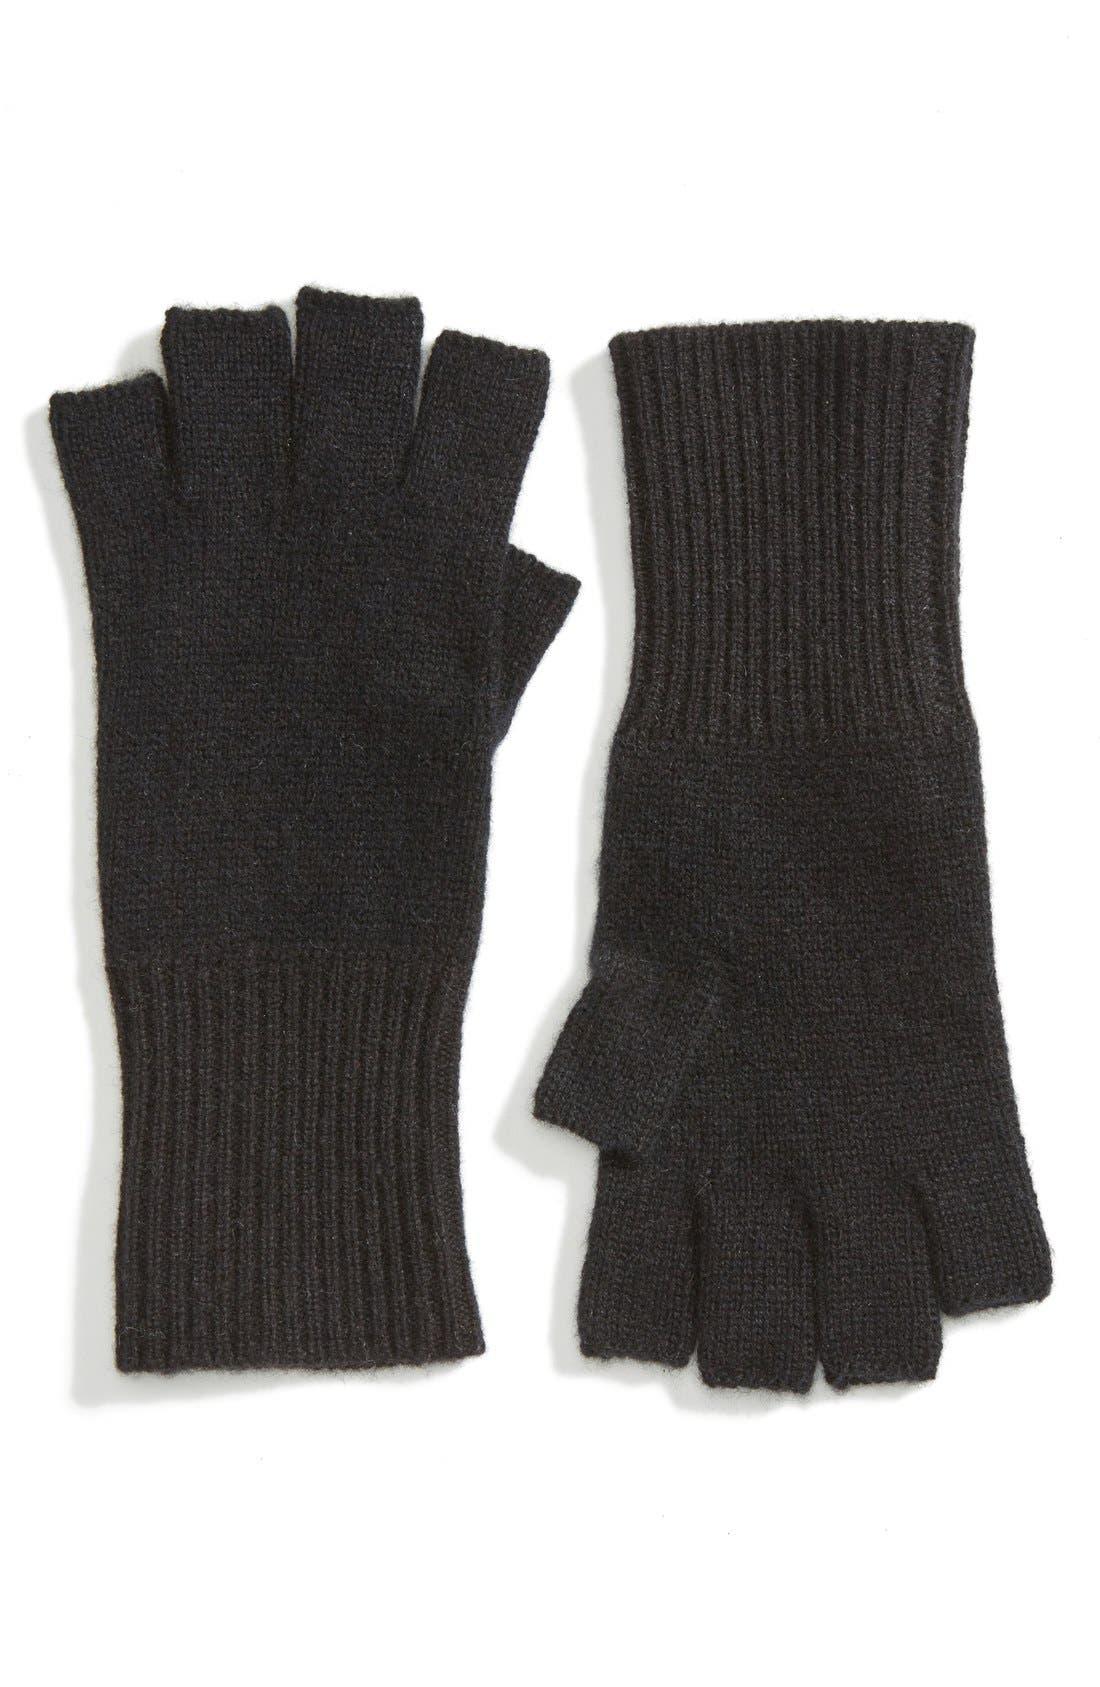 Cashmere Fingerless Gloves,                             Main thumbnail 1, color,                             Black